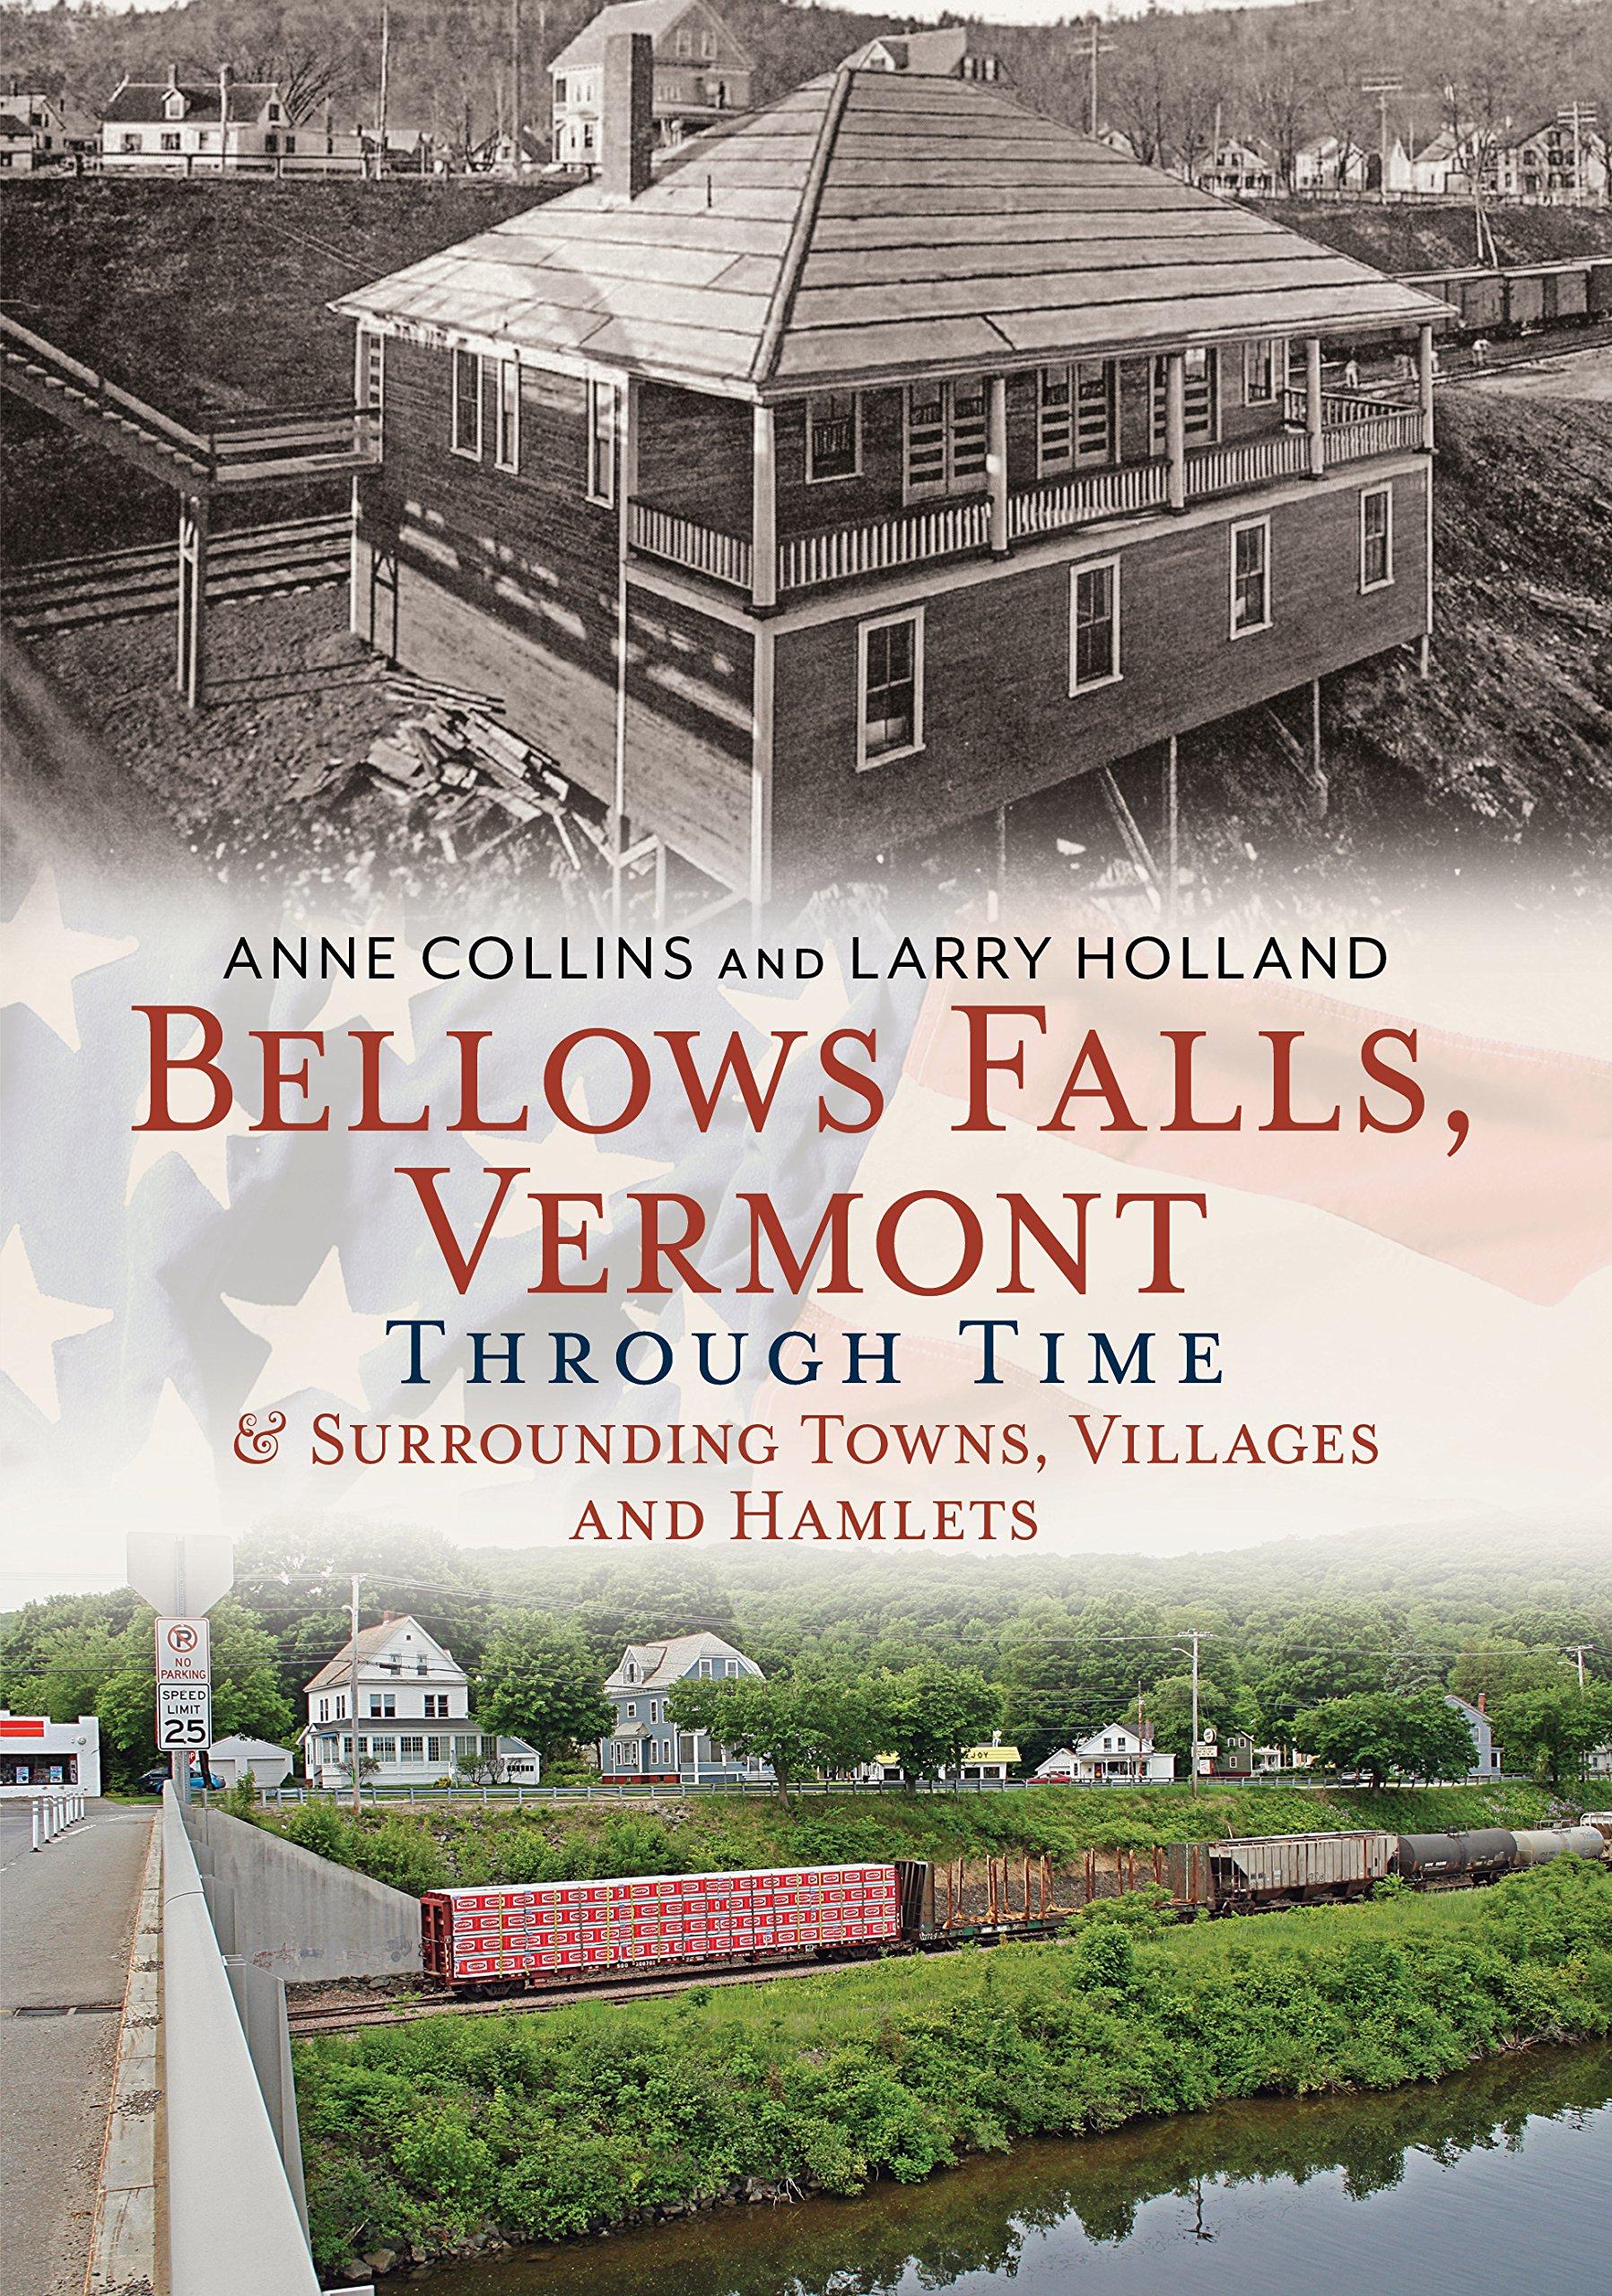 Bellows Falls, Vermont Through Time & Surrounding